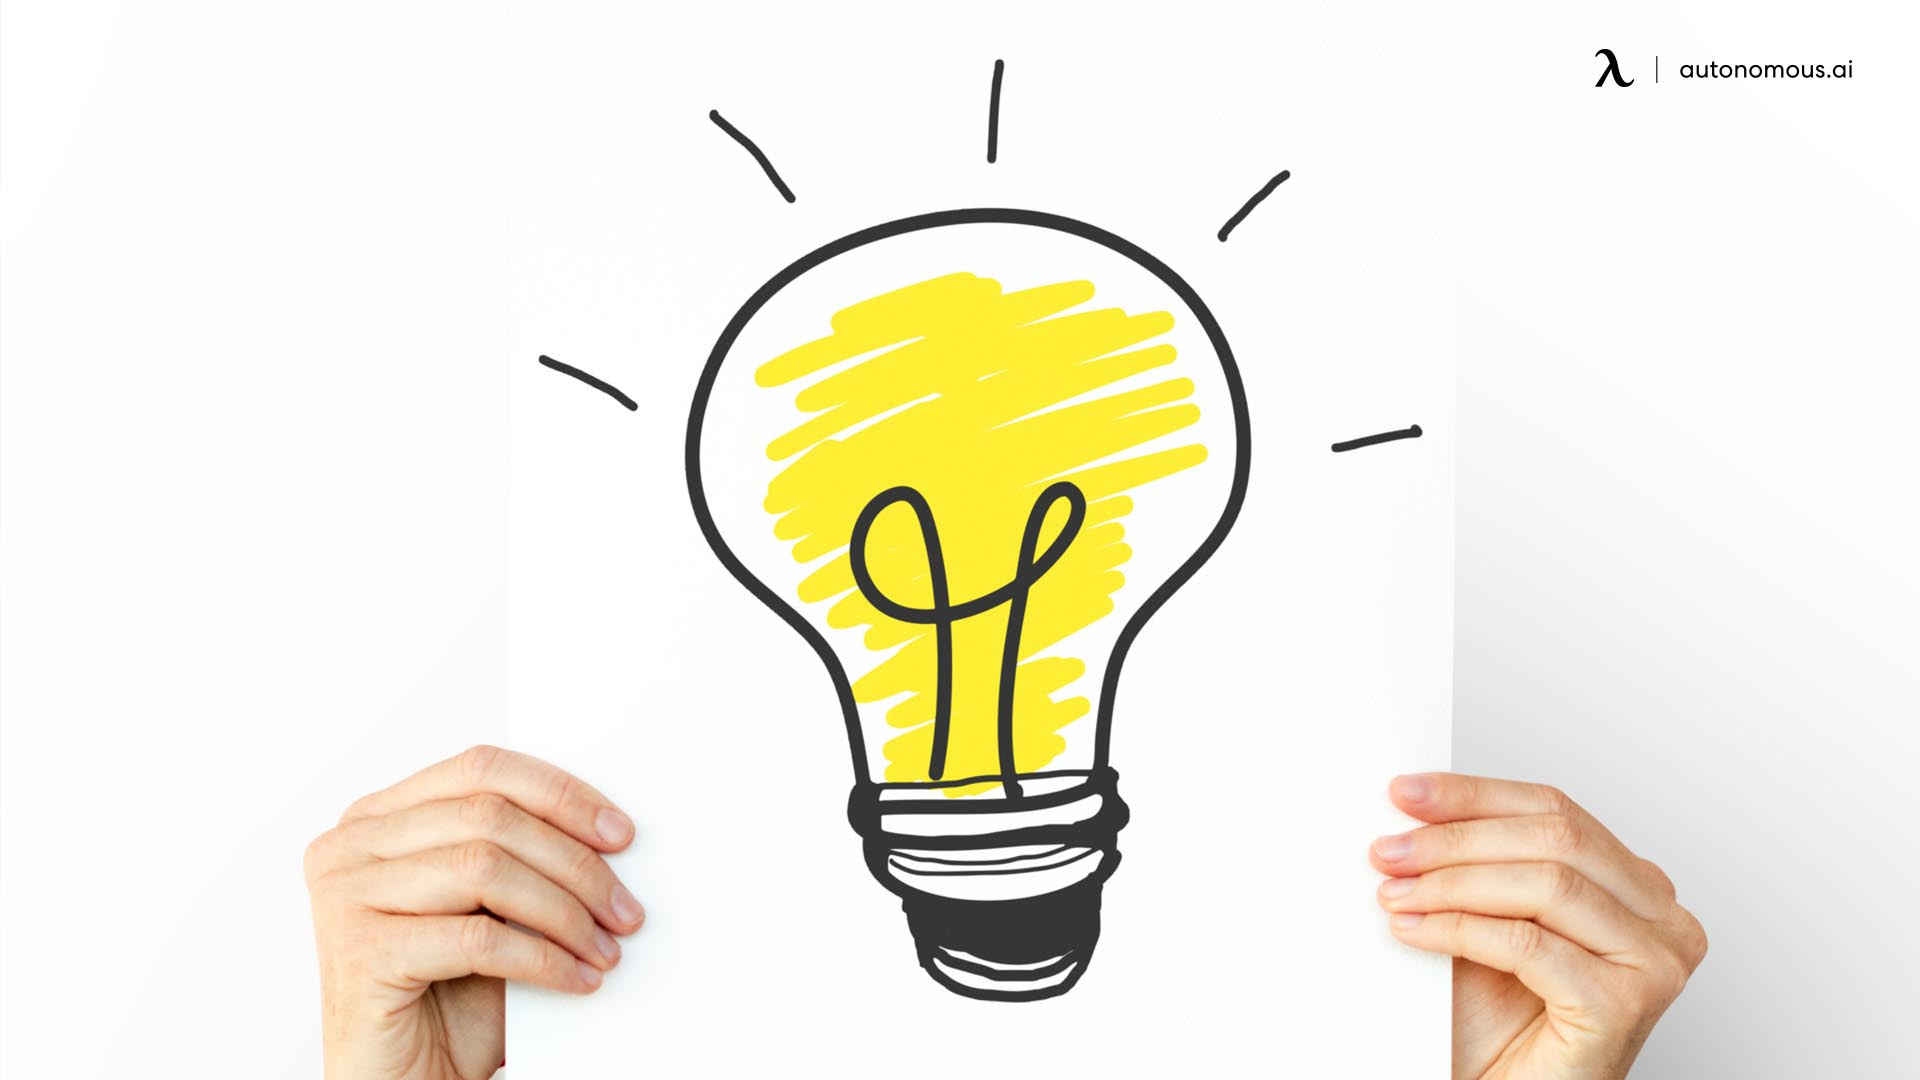 offering new ideas